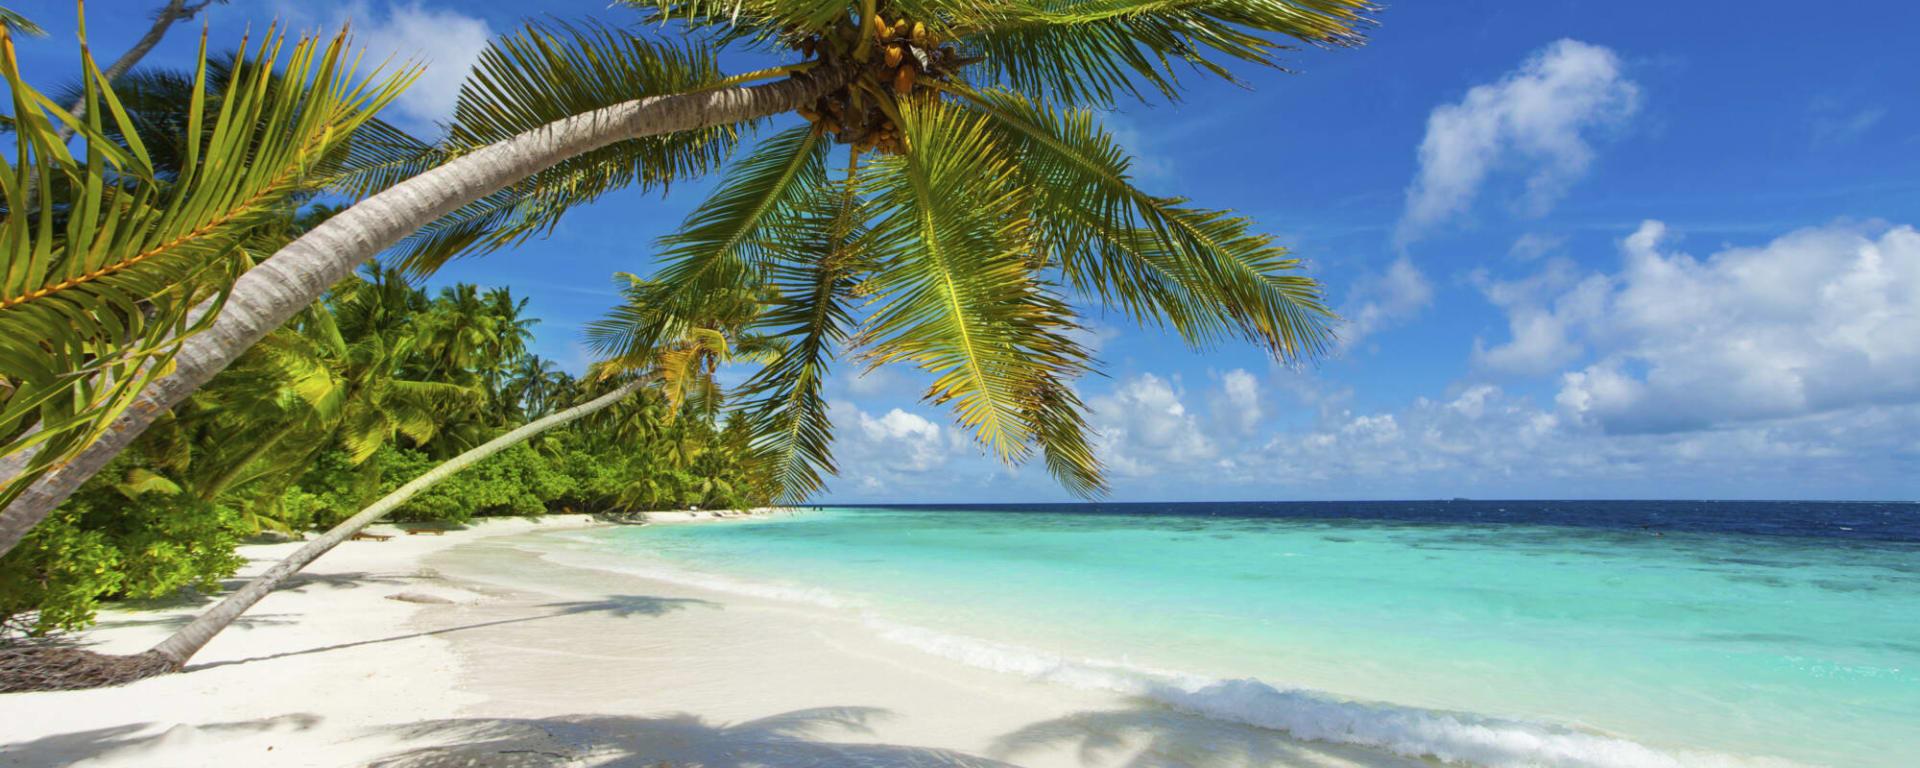 Malediven entdecken mit Tischler Reisen: Malediven Strand Palmen Meer